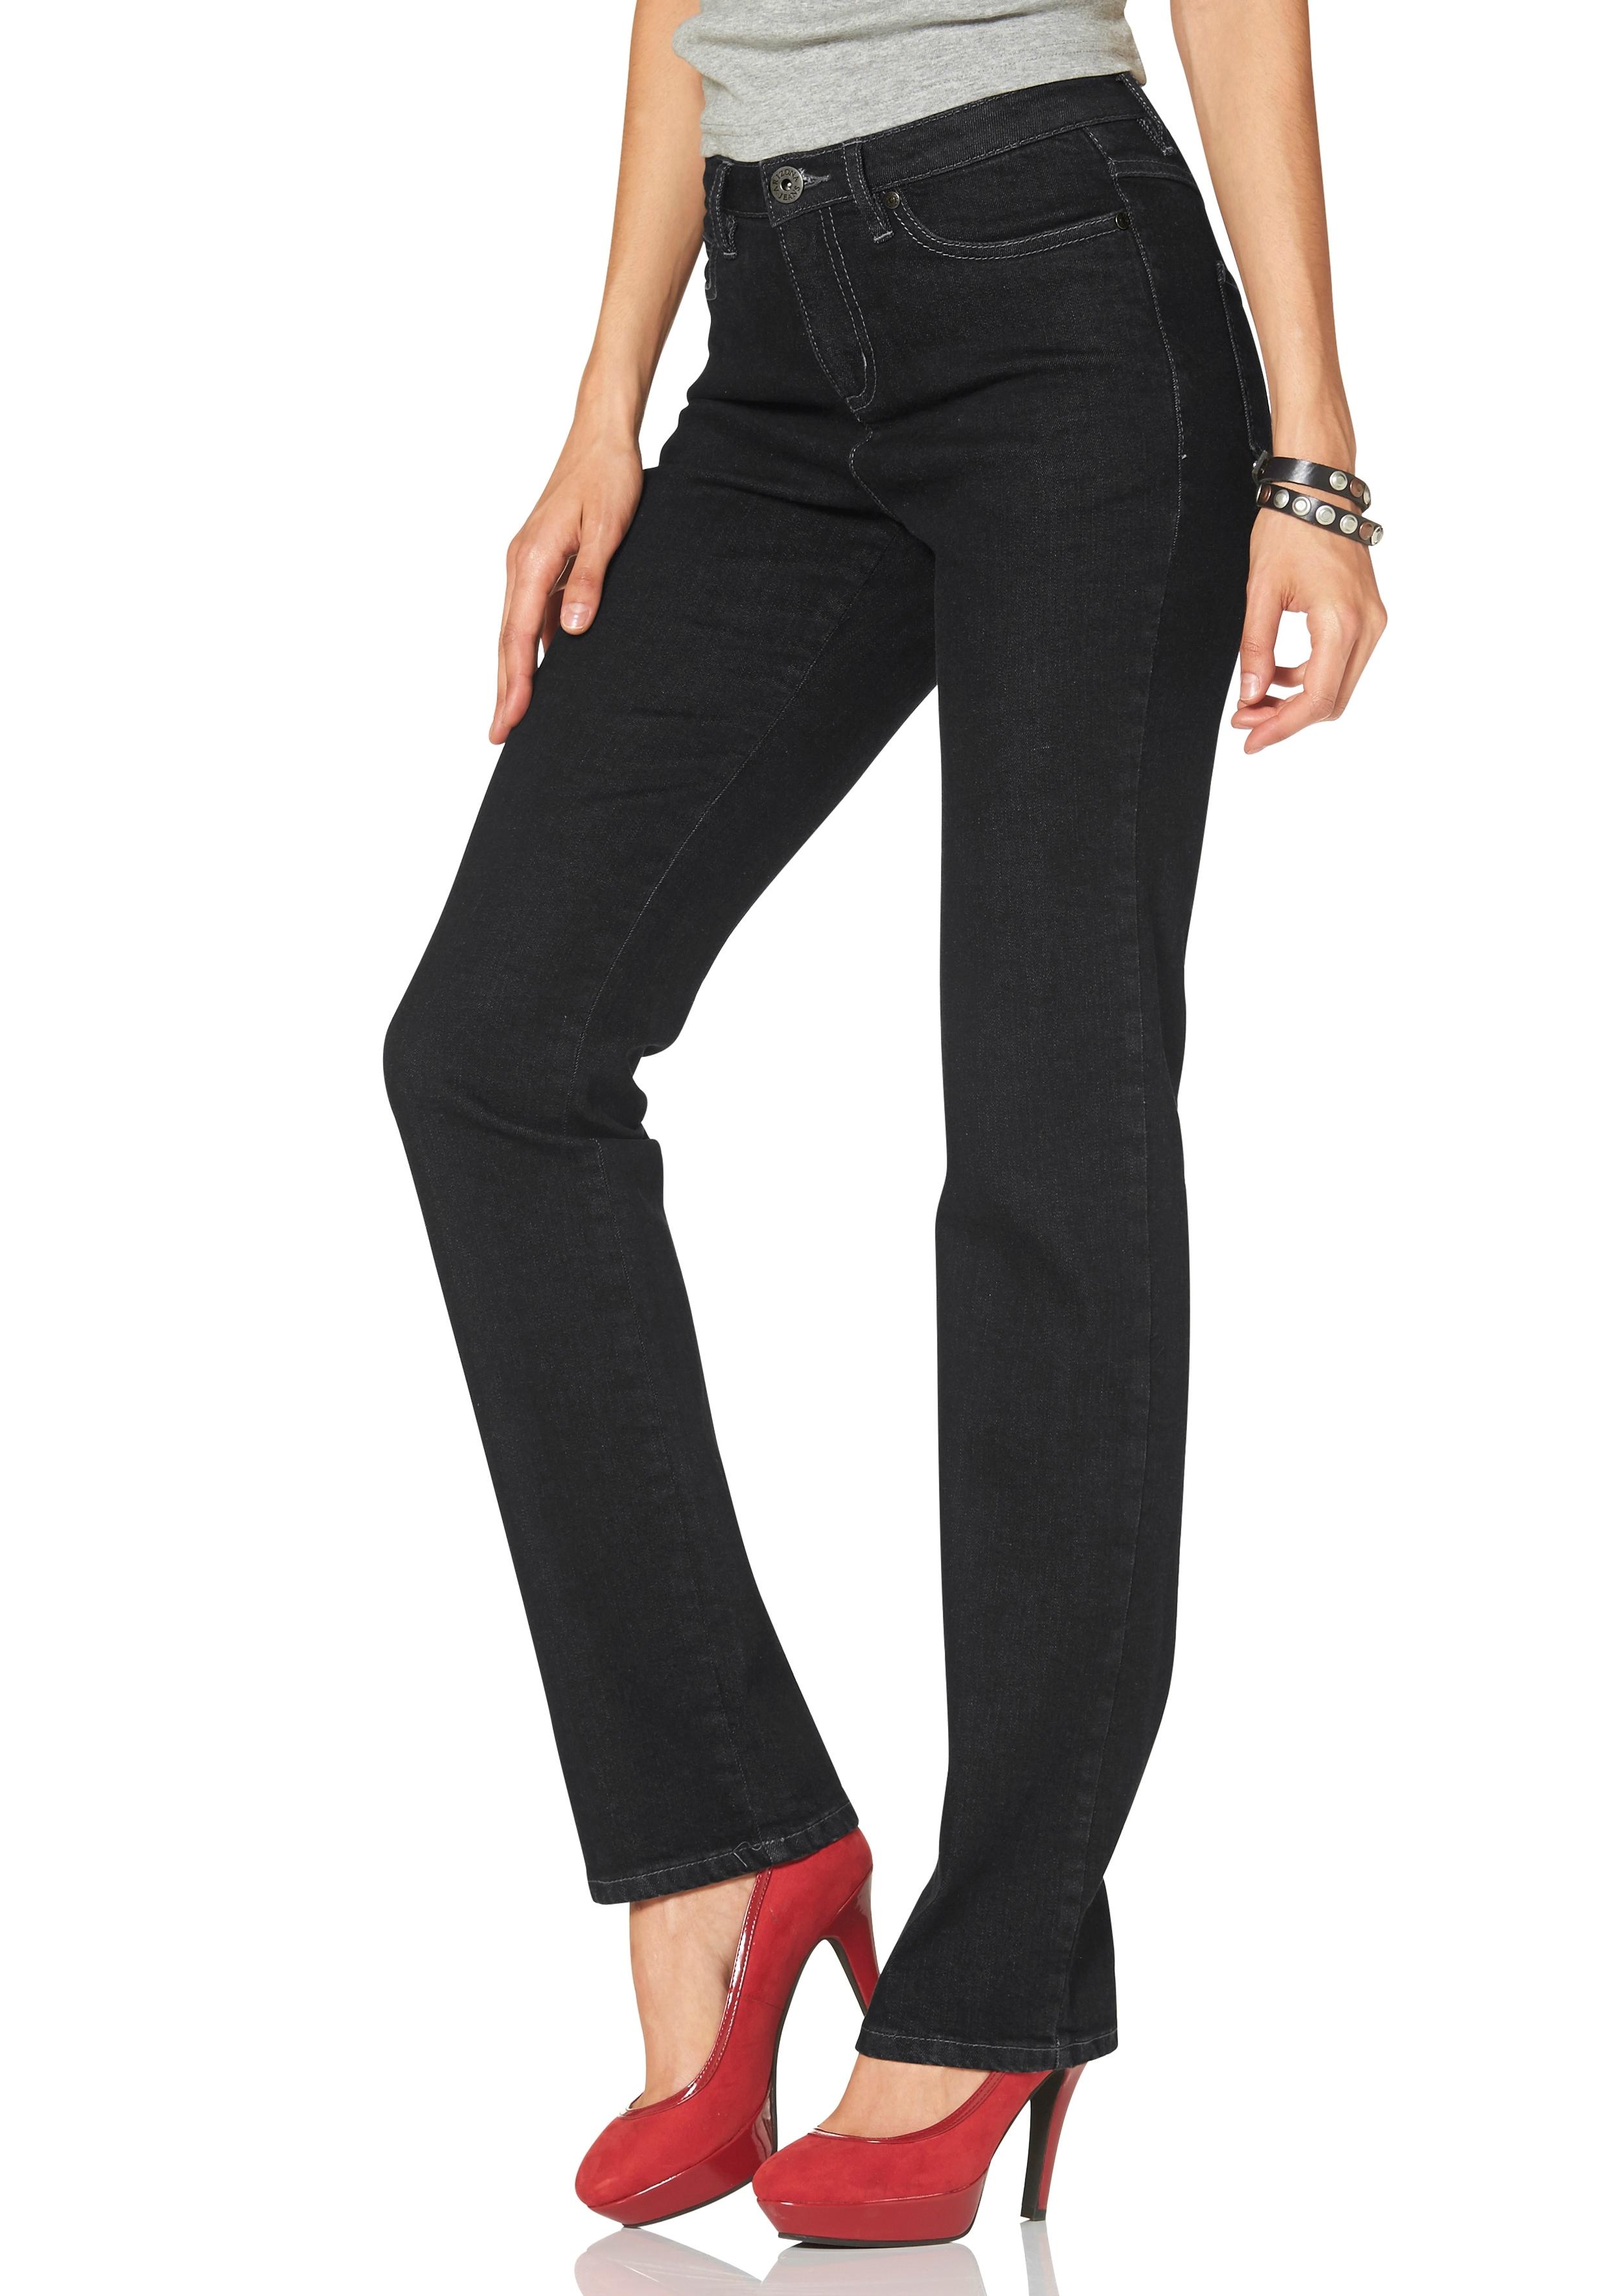 ARIZONA Jeans in 5-pocketsmodel online kopen op otto.nl